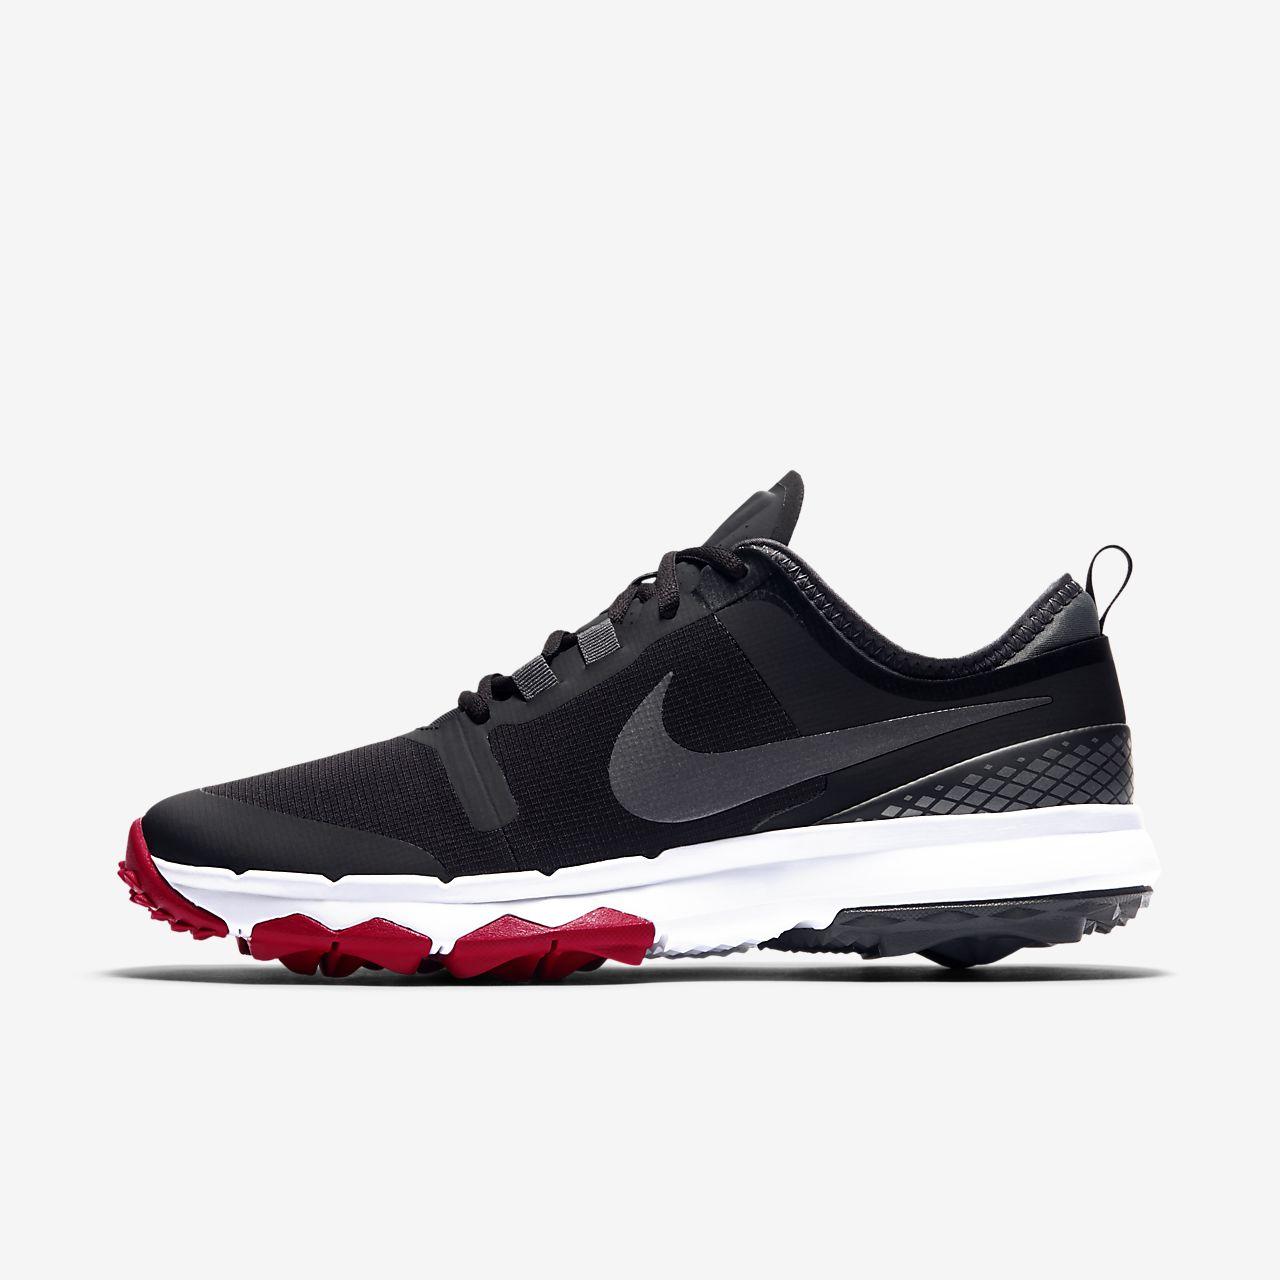 Nike Golf Fi Impact 2 - Black/Cool Grey/White/Anthracite/Volt Golf Shoes